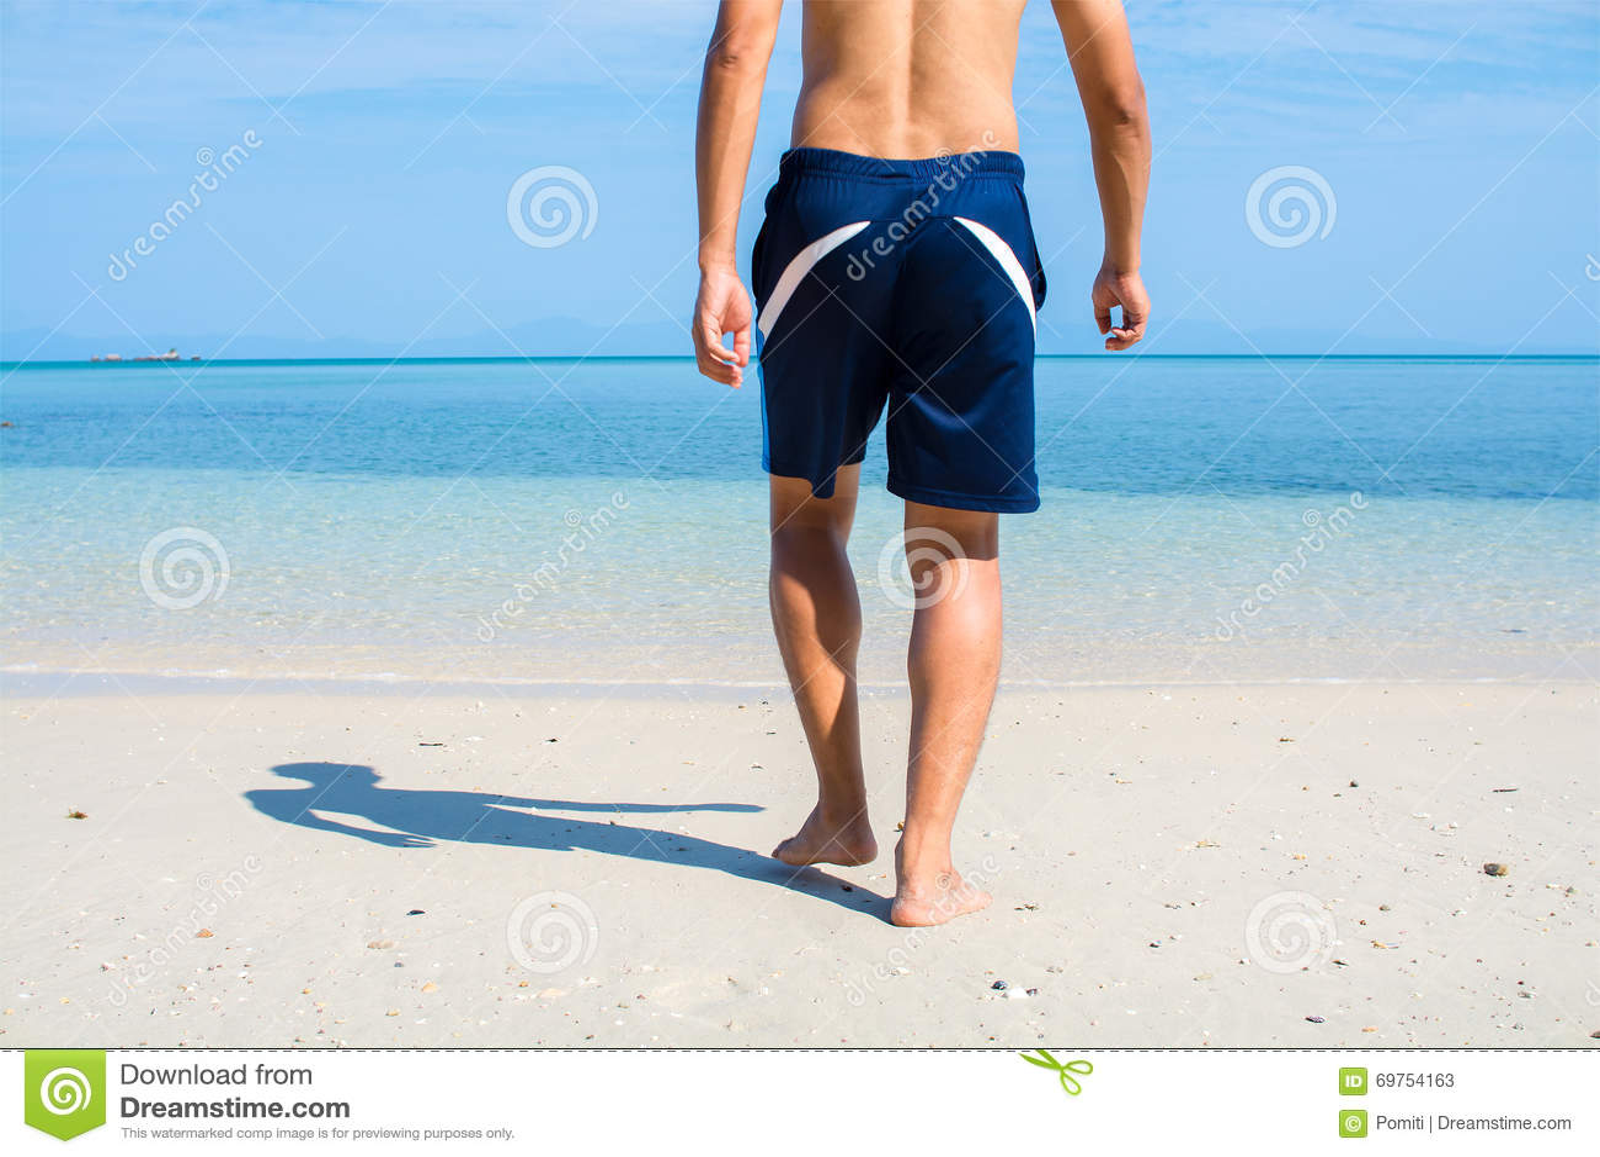 Man with no shirt walking barefoot